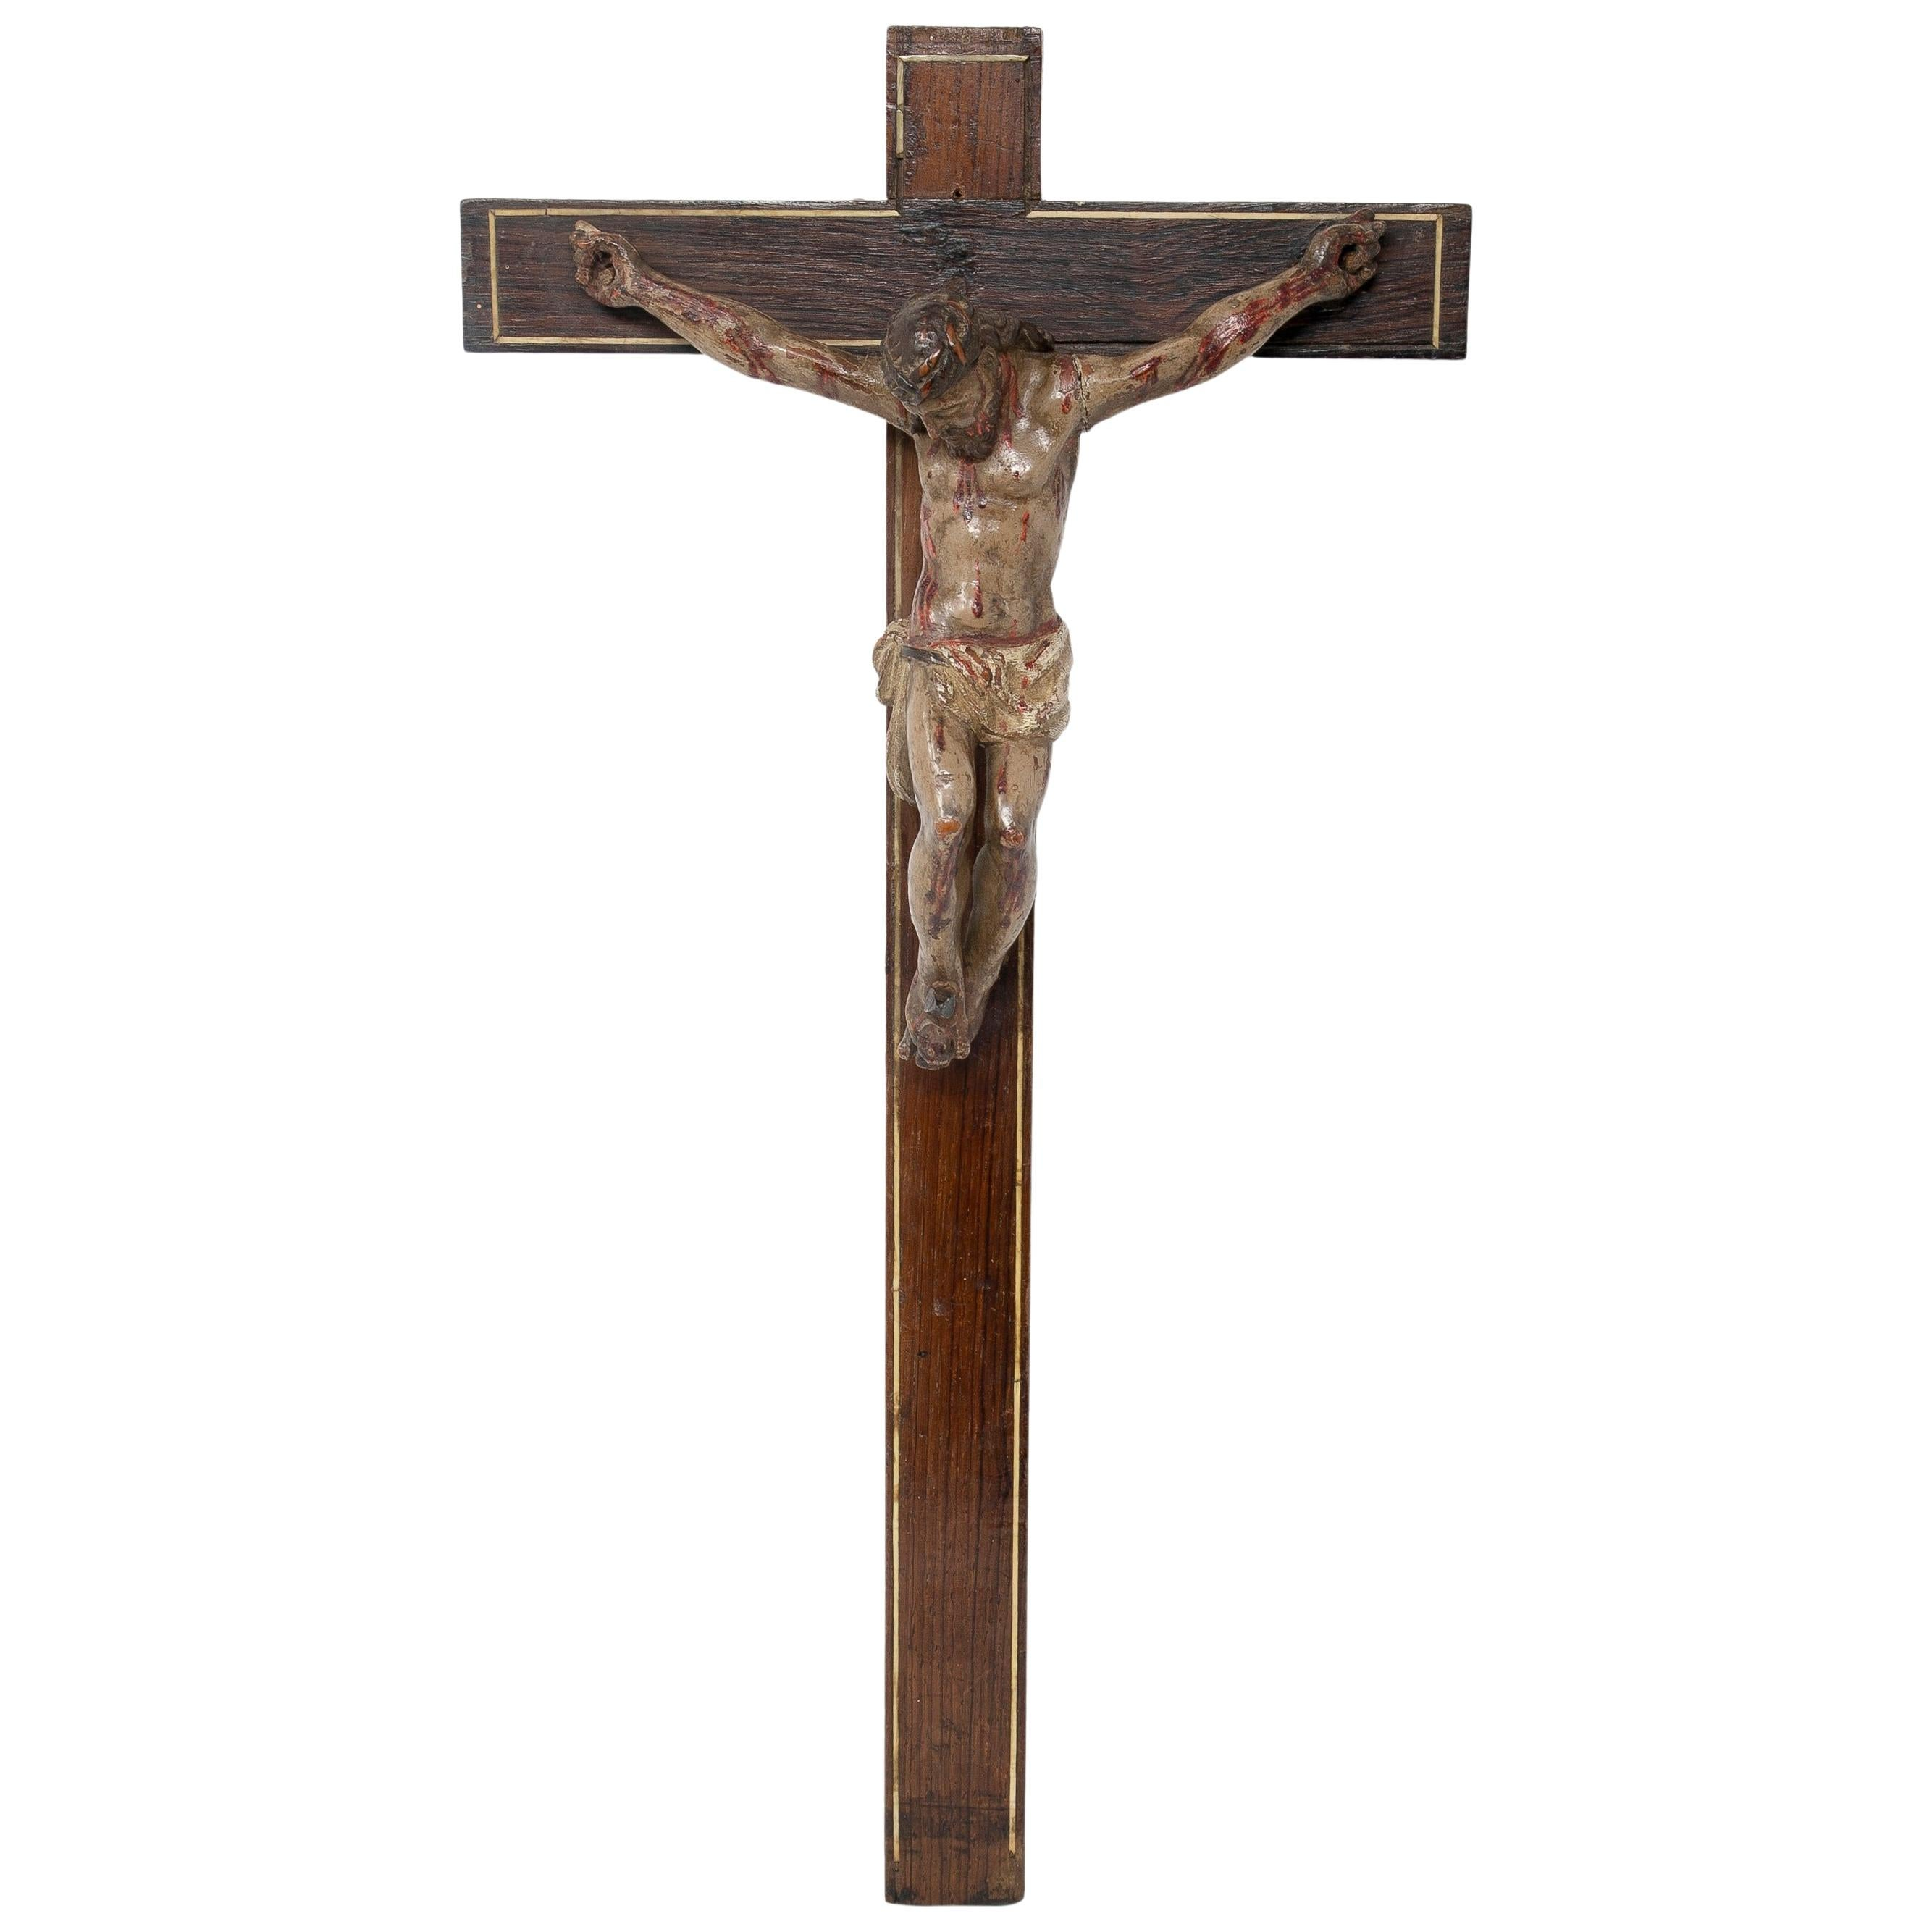 17th Century Spanish Wooden Crucifix Figure Sculpture